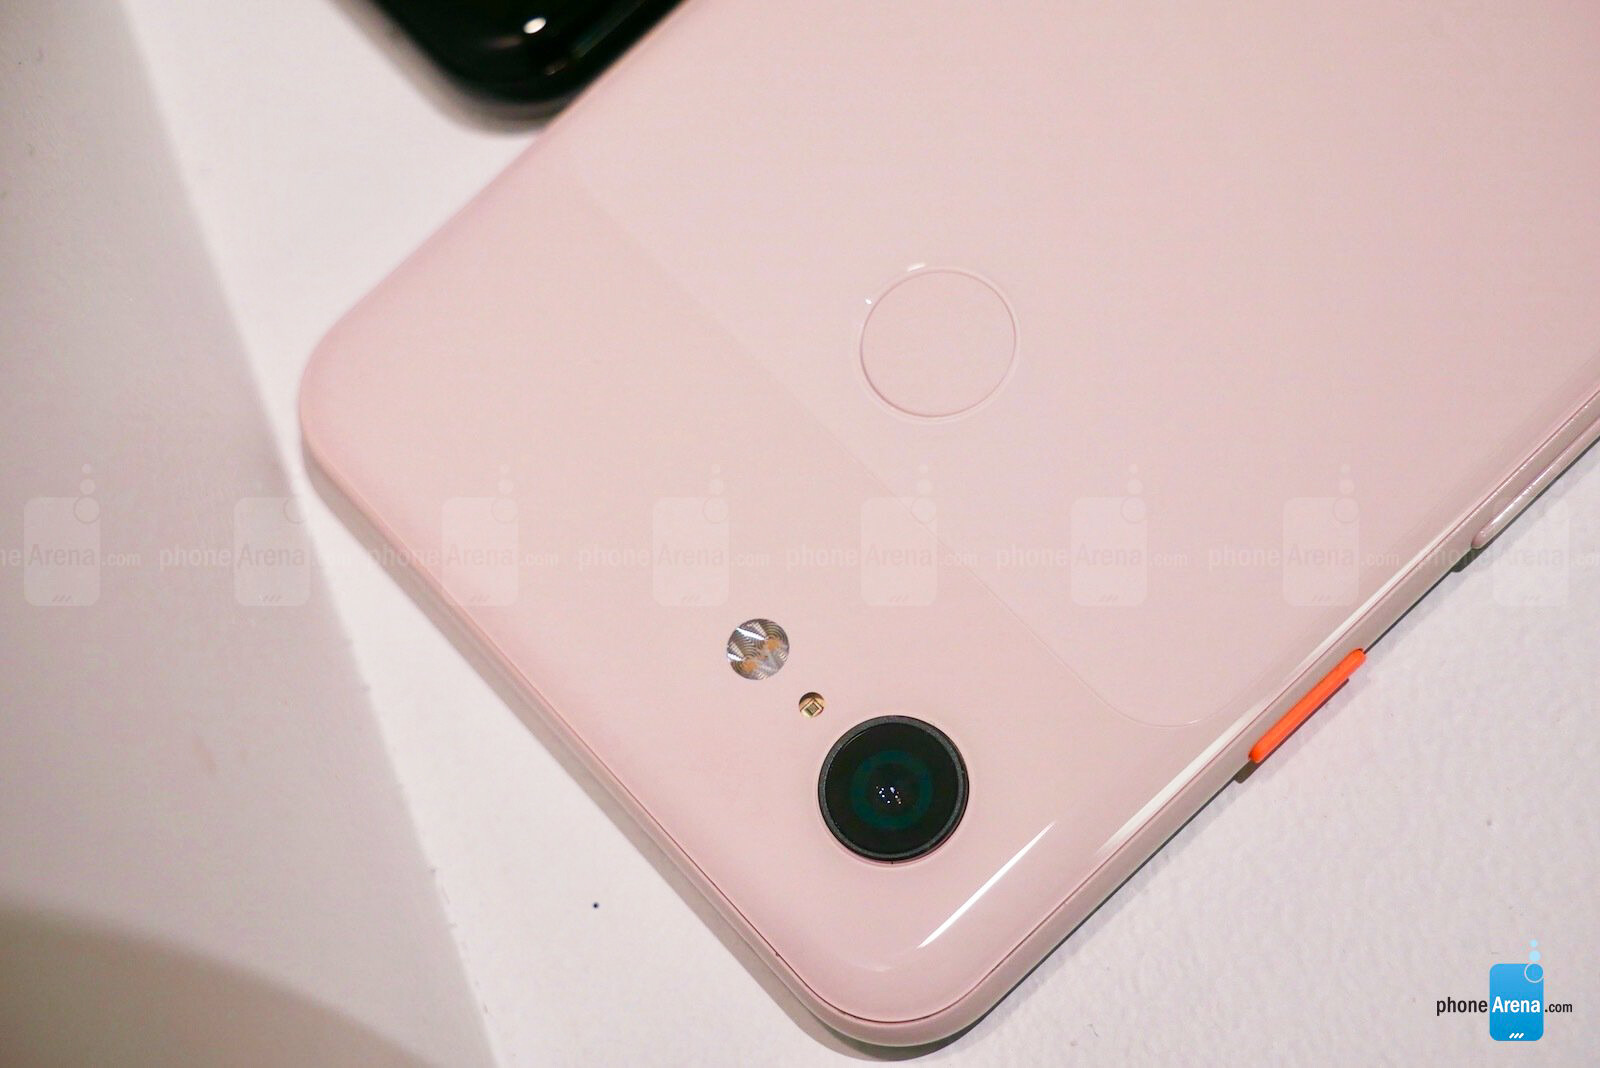 Google Pixel 3 and Pixel 3 XL Hands-On | PhoneArena reviews